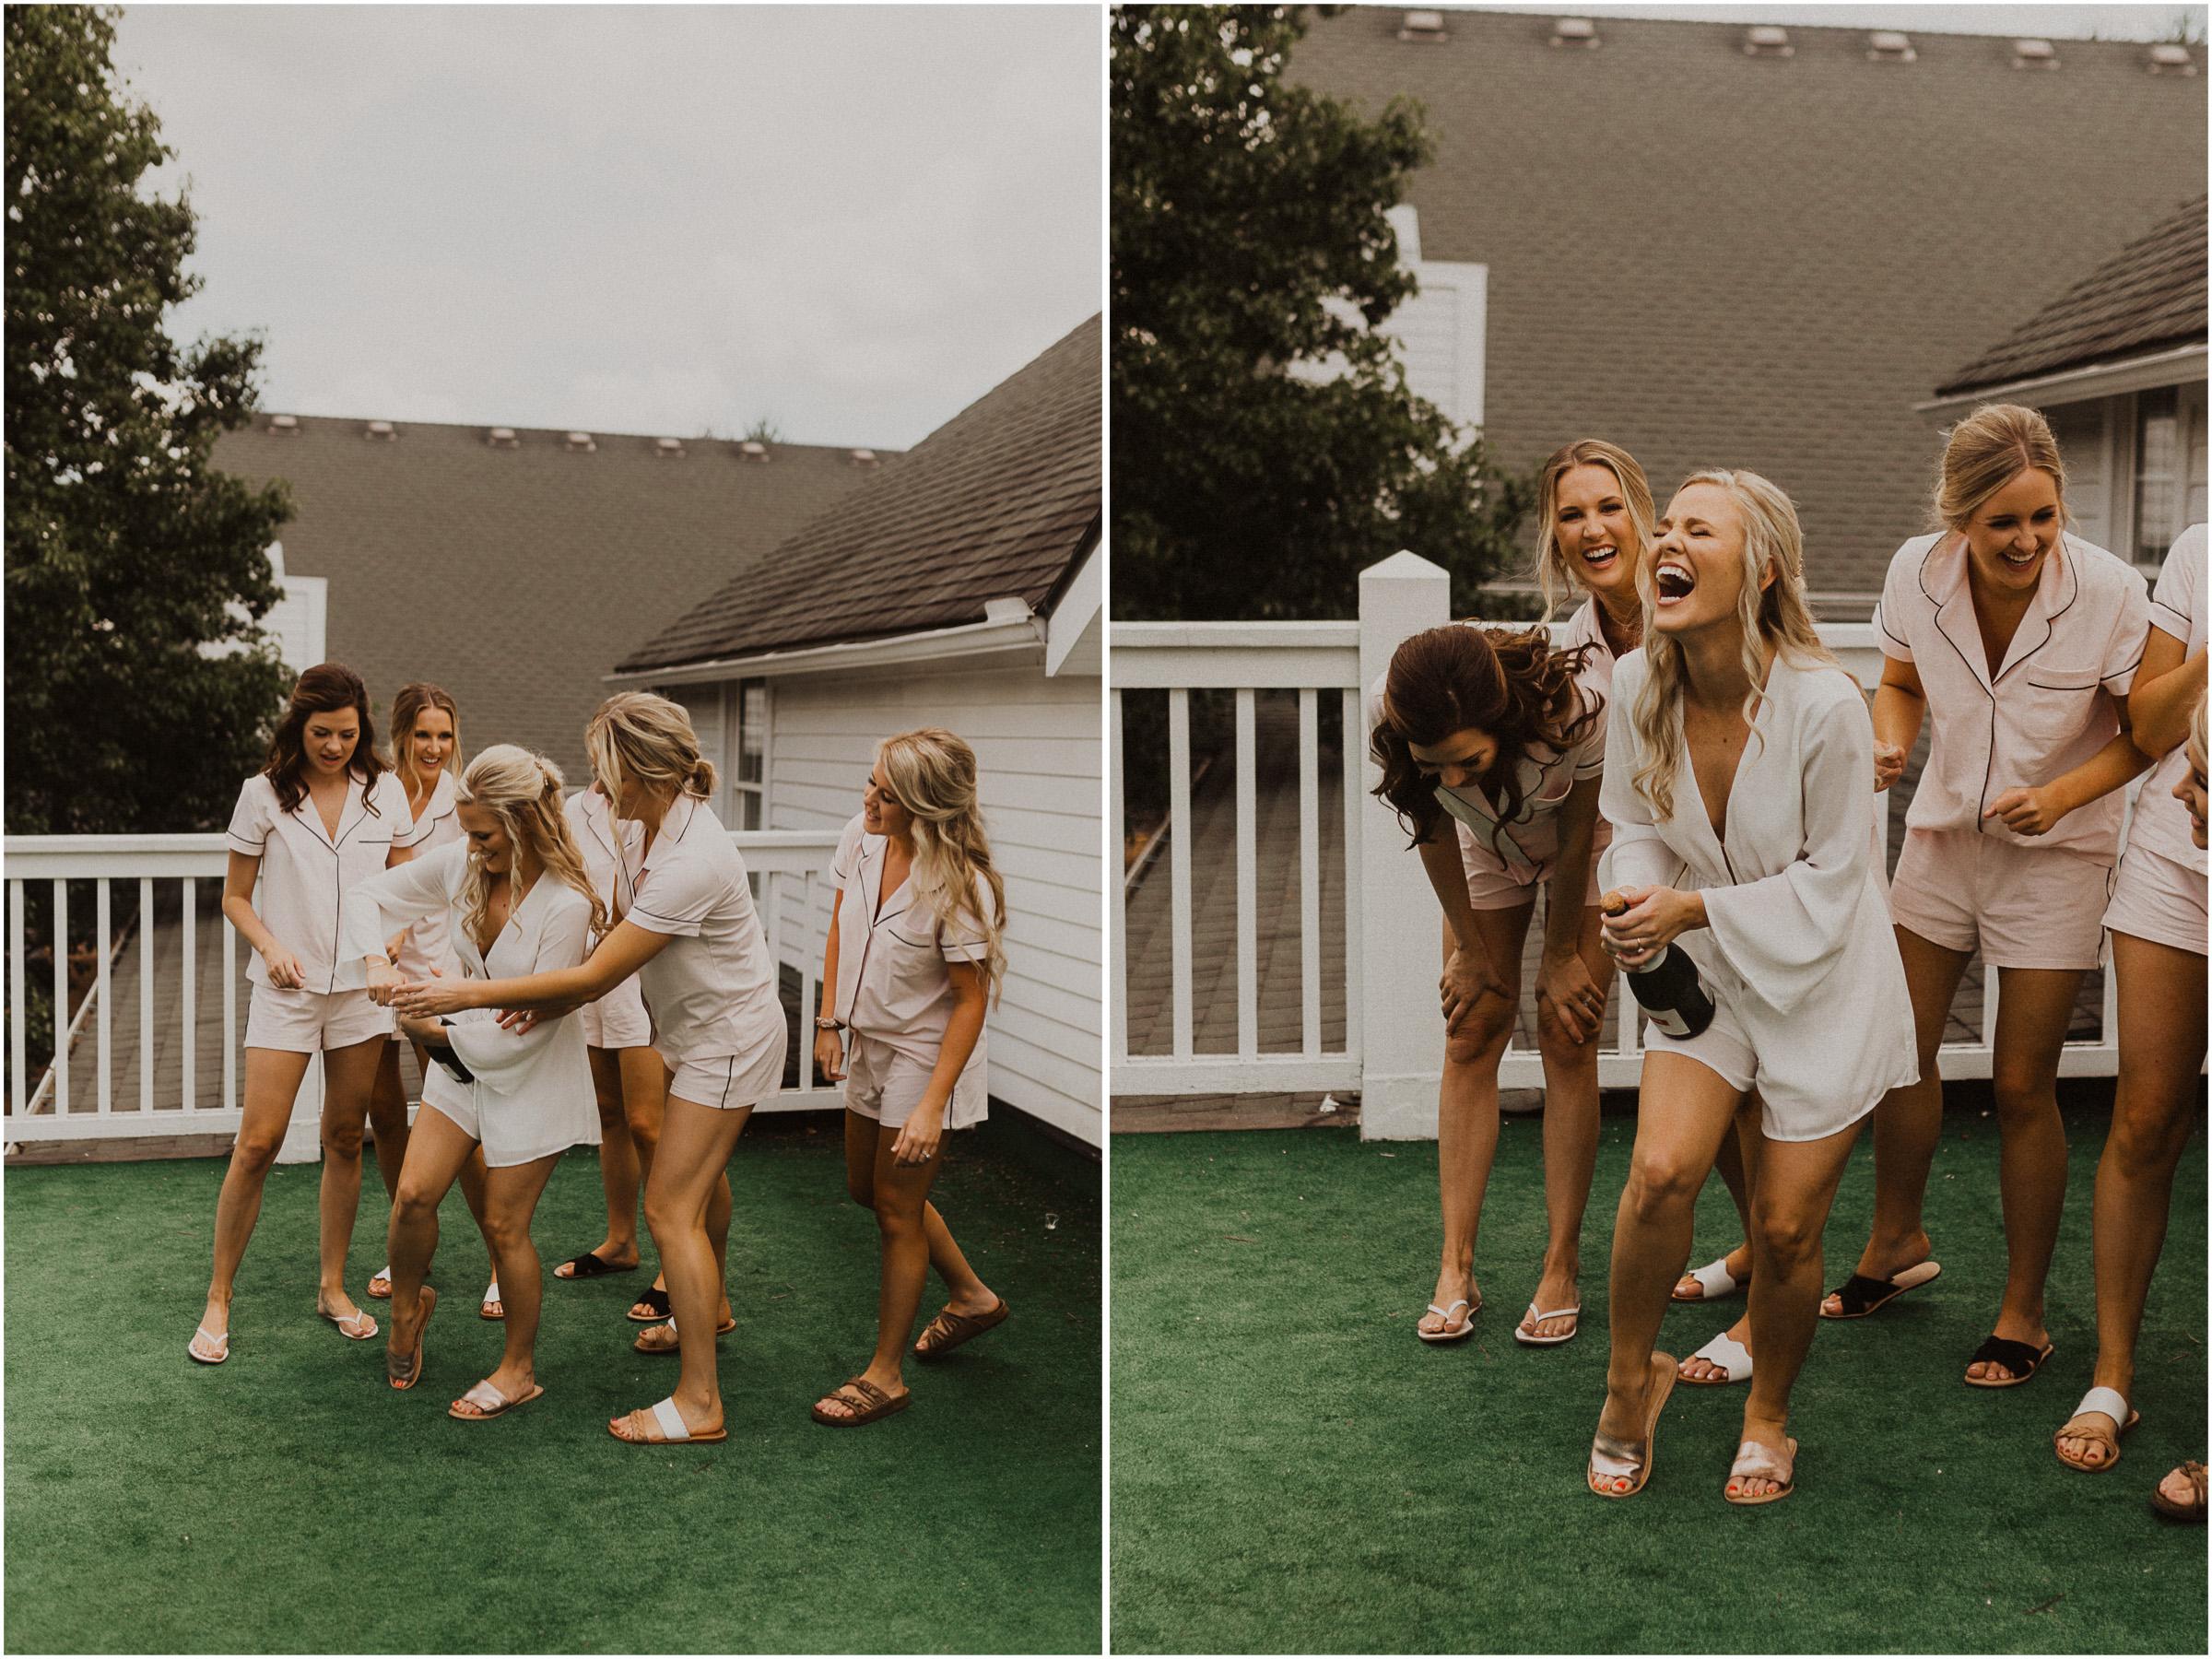 alyssa barletter photography hawthorne house summer outdoor wedding southern charm inspiration-5.jpg